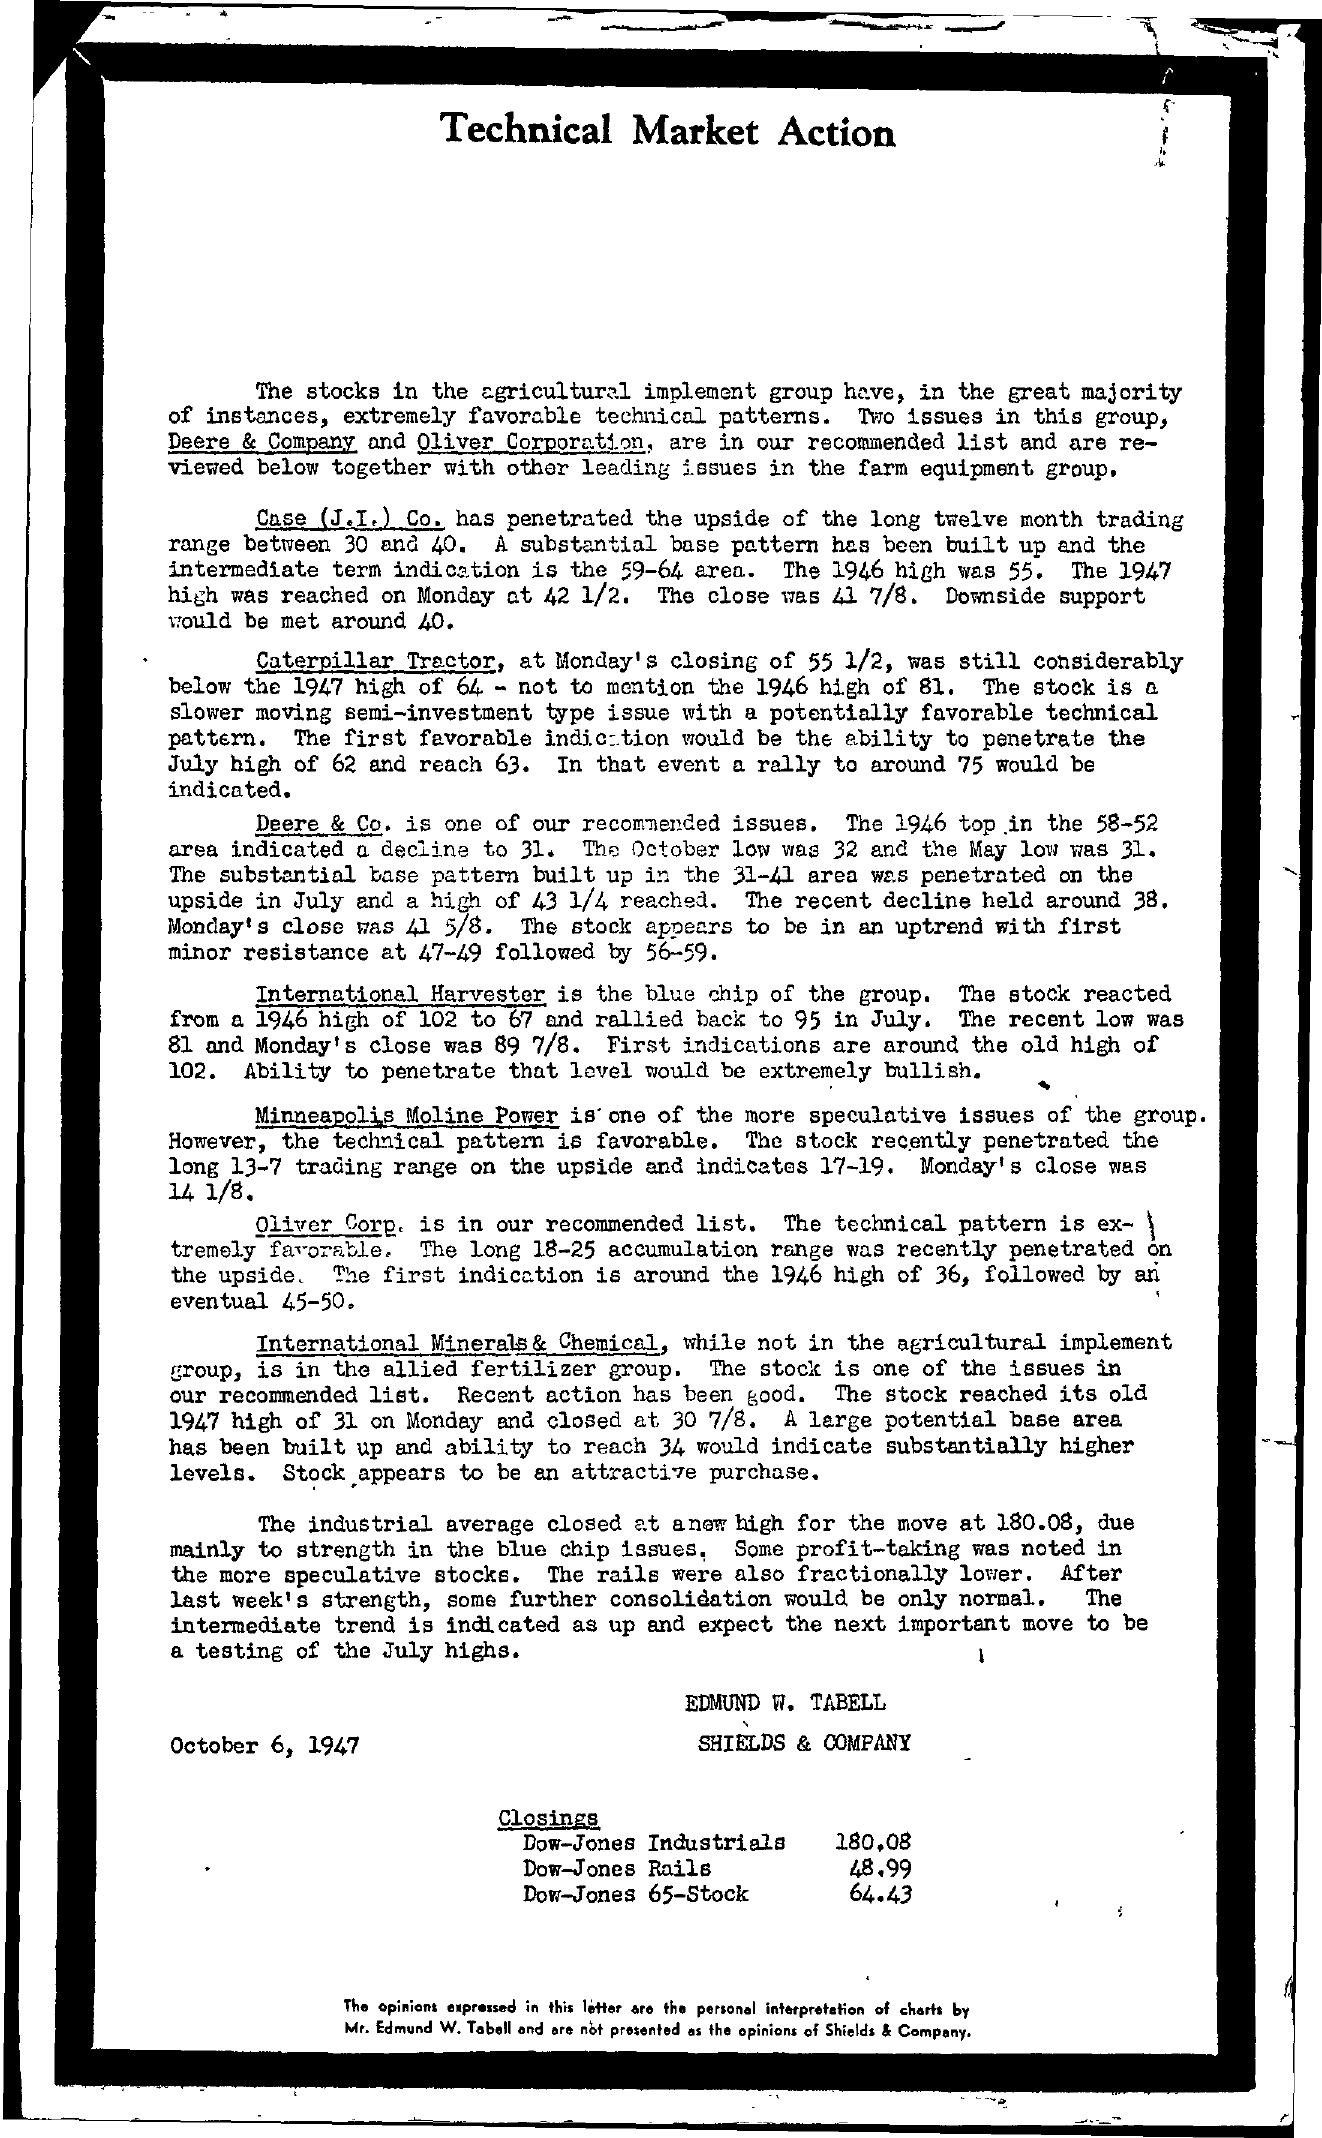 Tabell's Market Letter - October 06, 1947